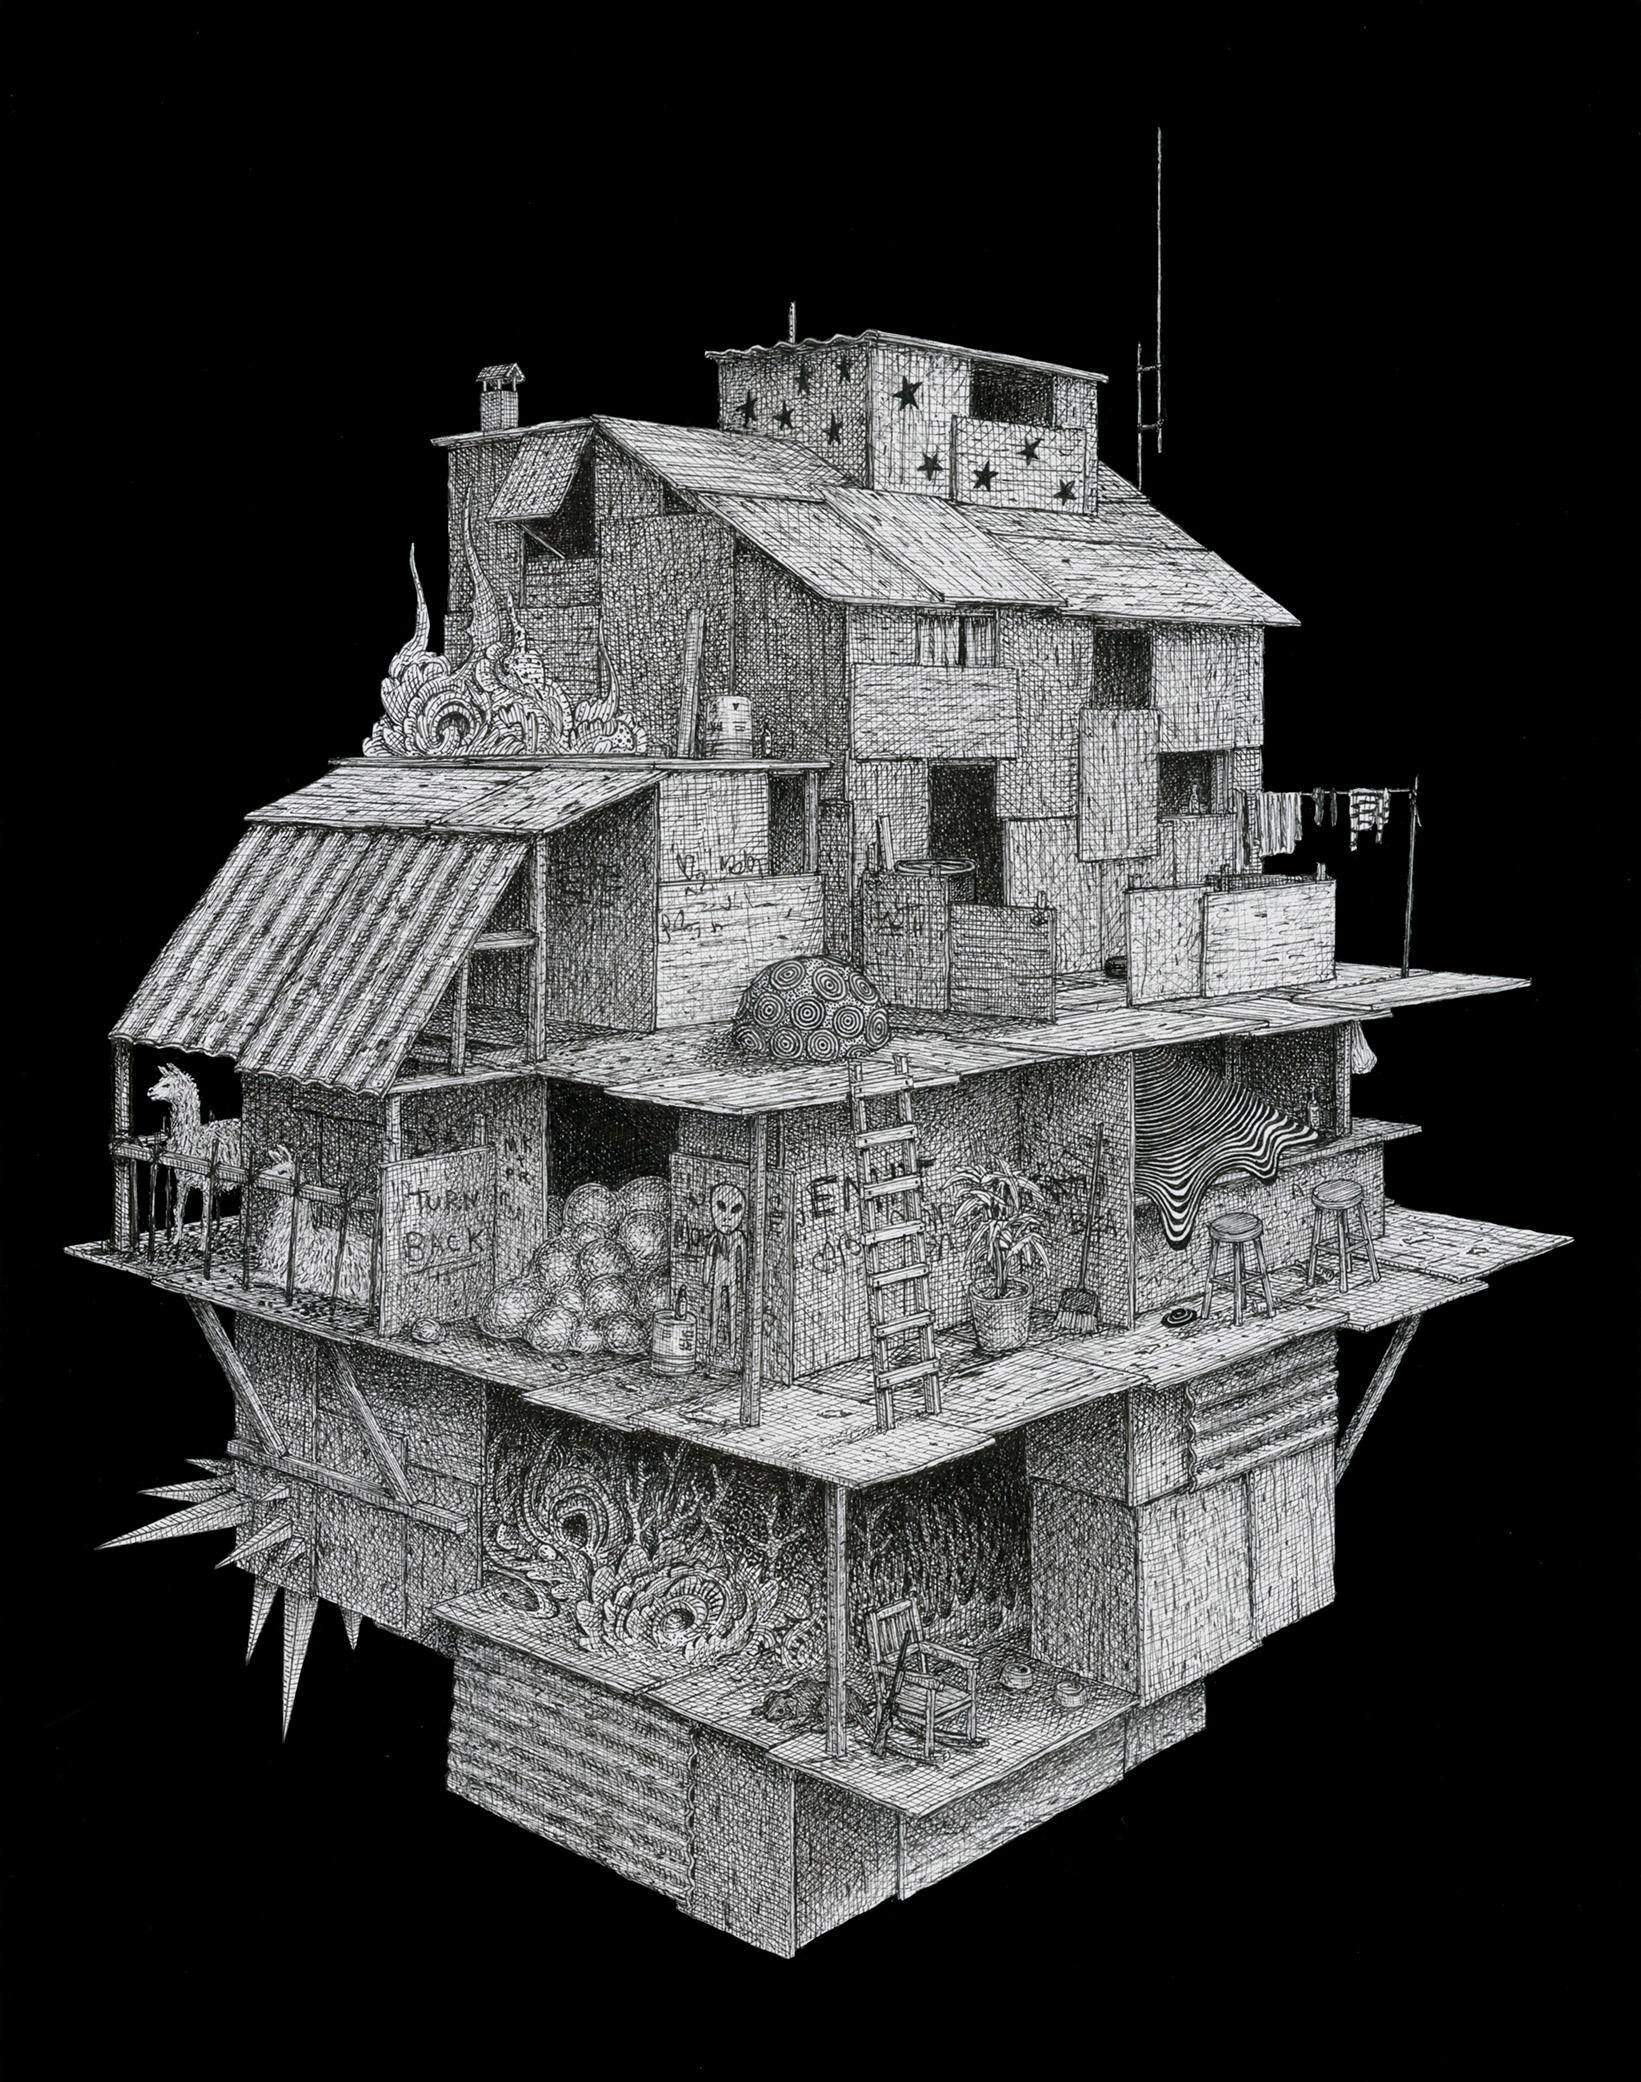 shantyspaceship_150dpi